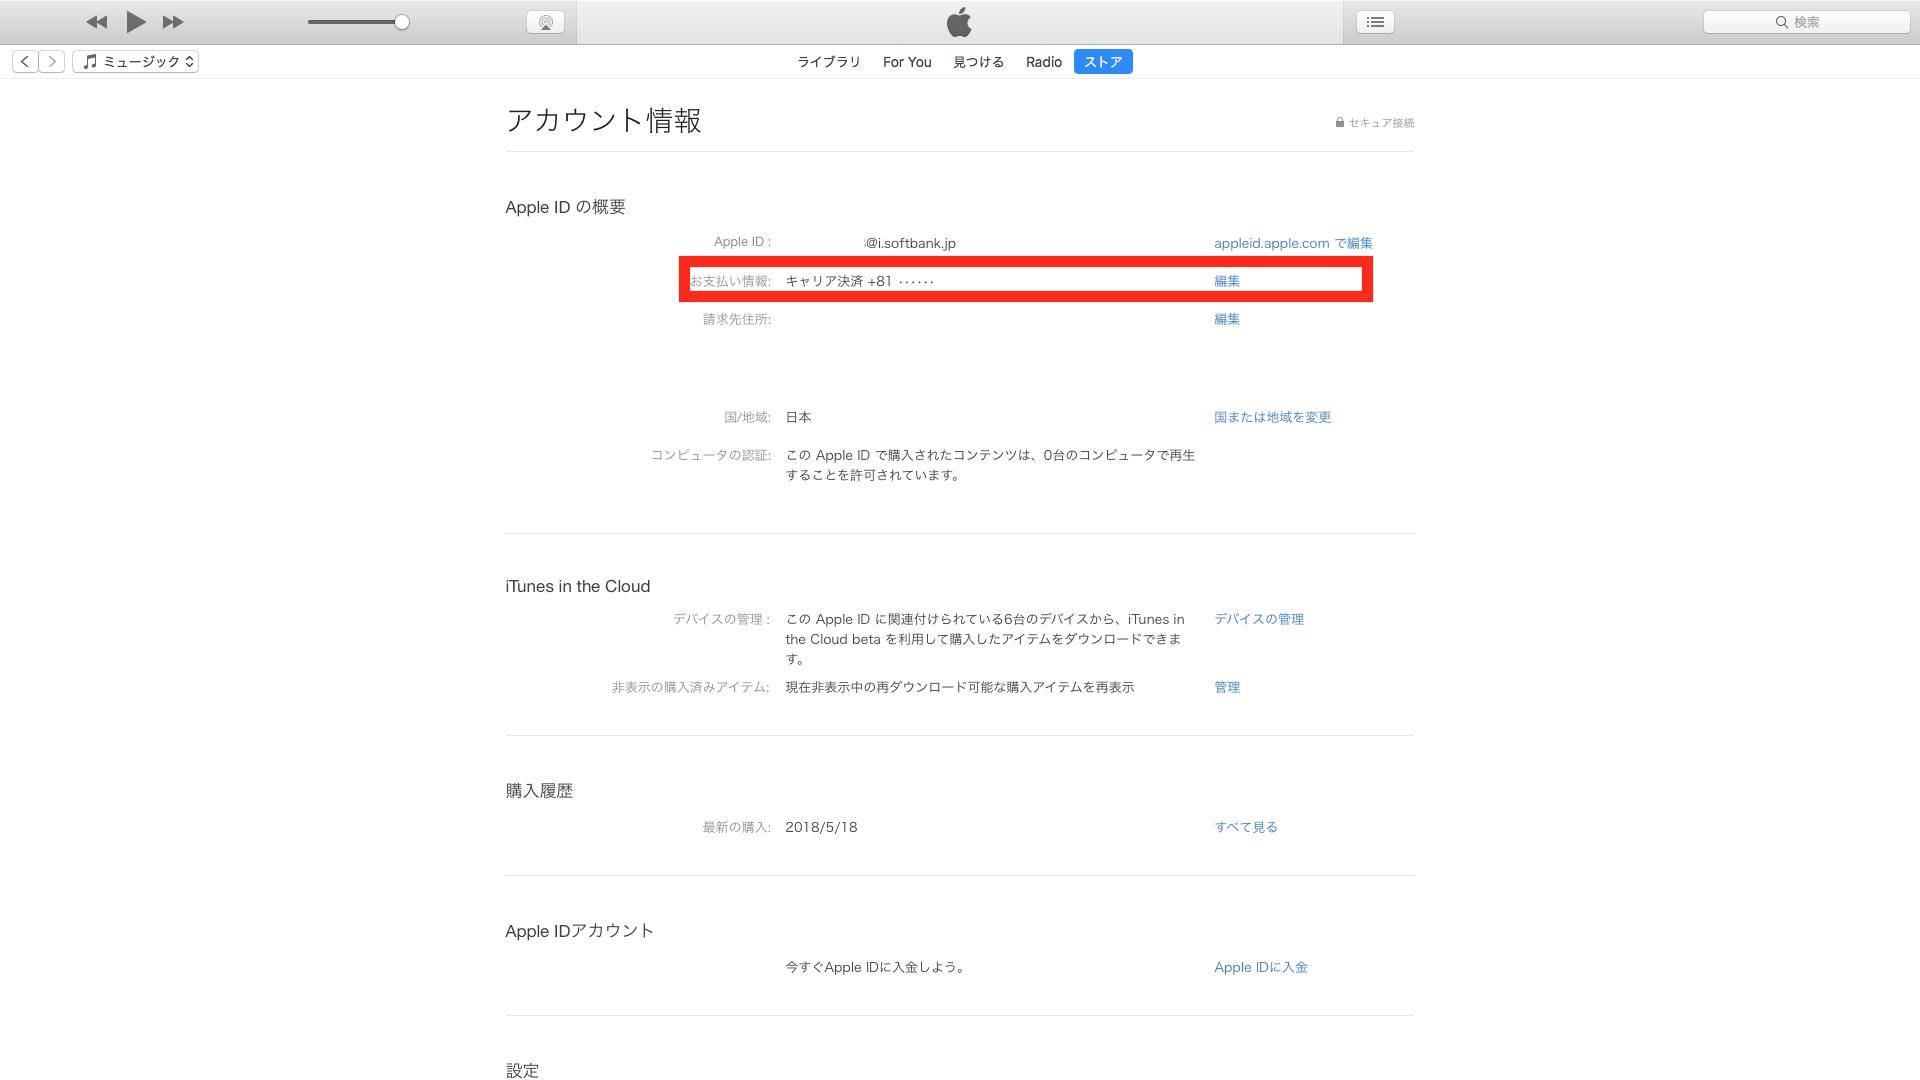 iTunes支払い方法